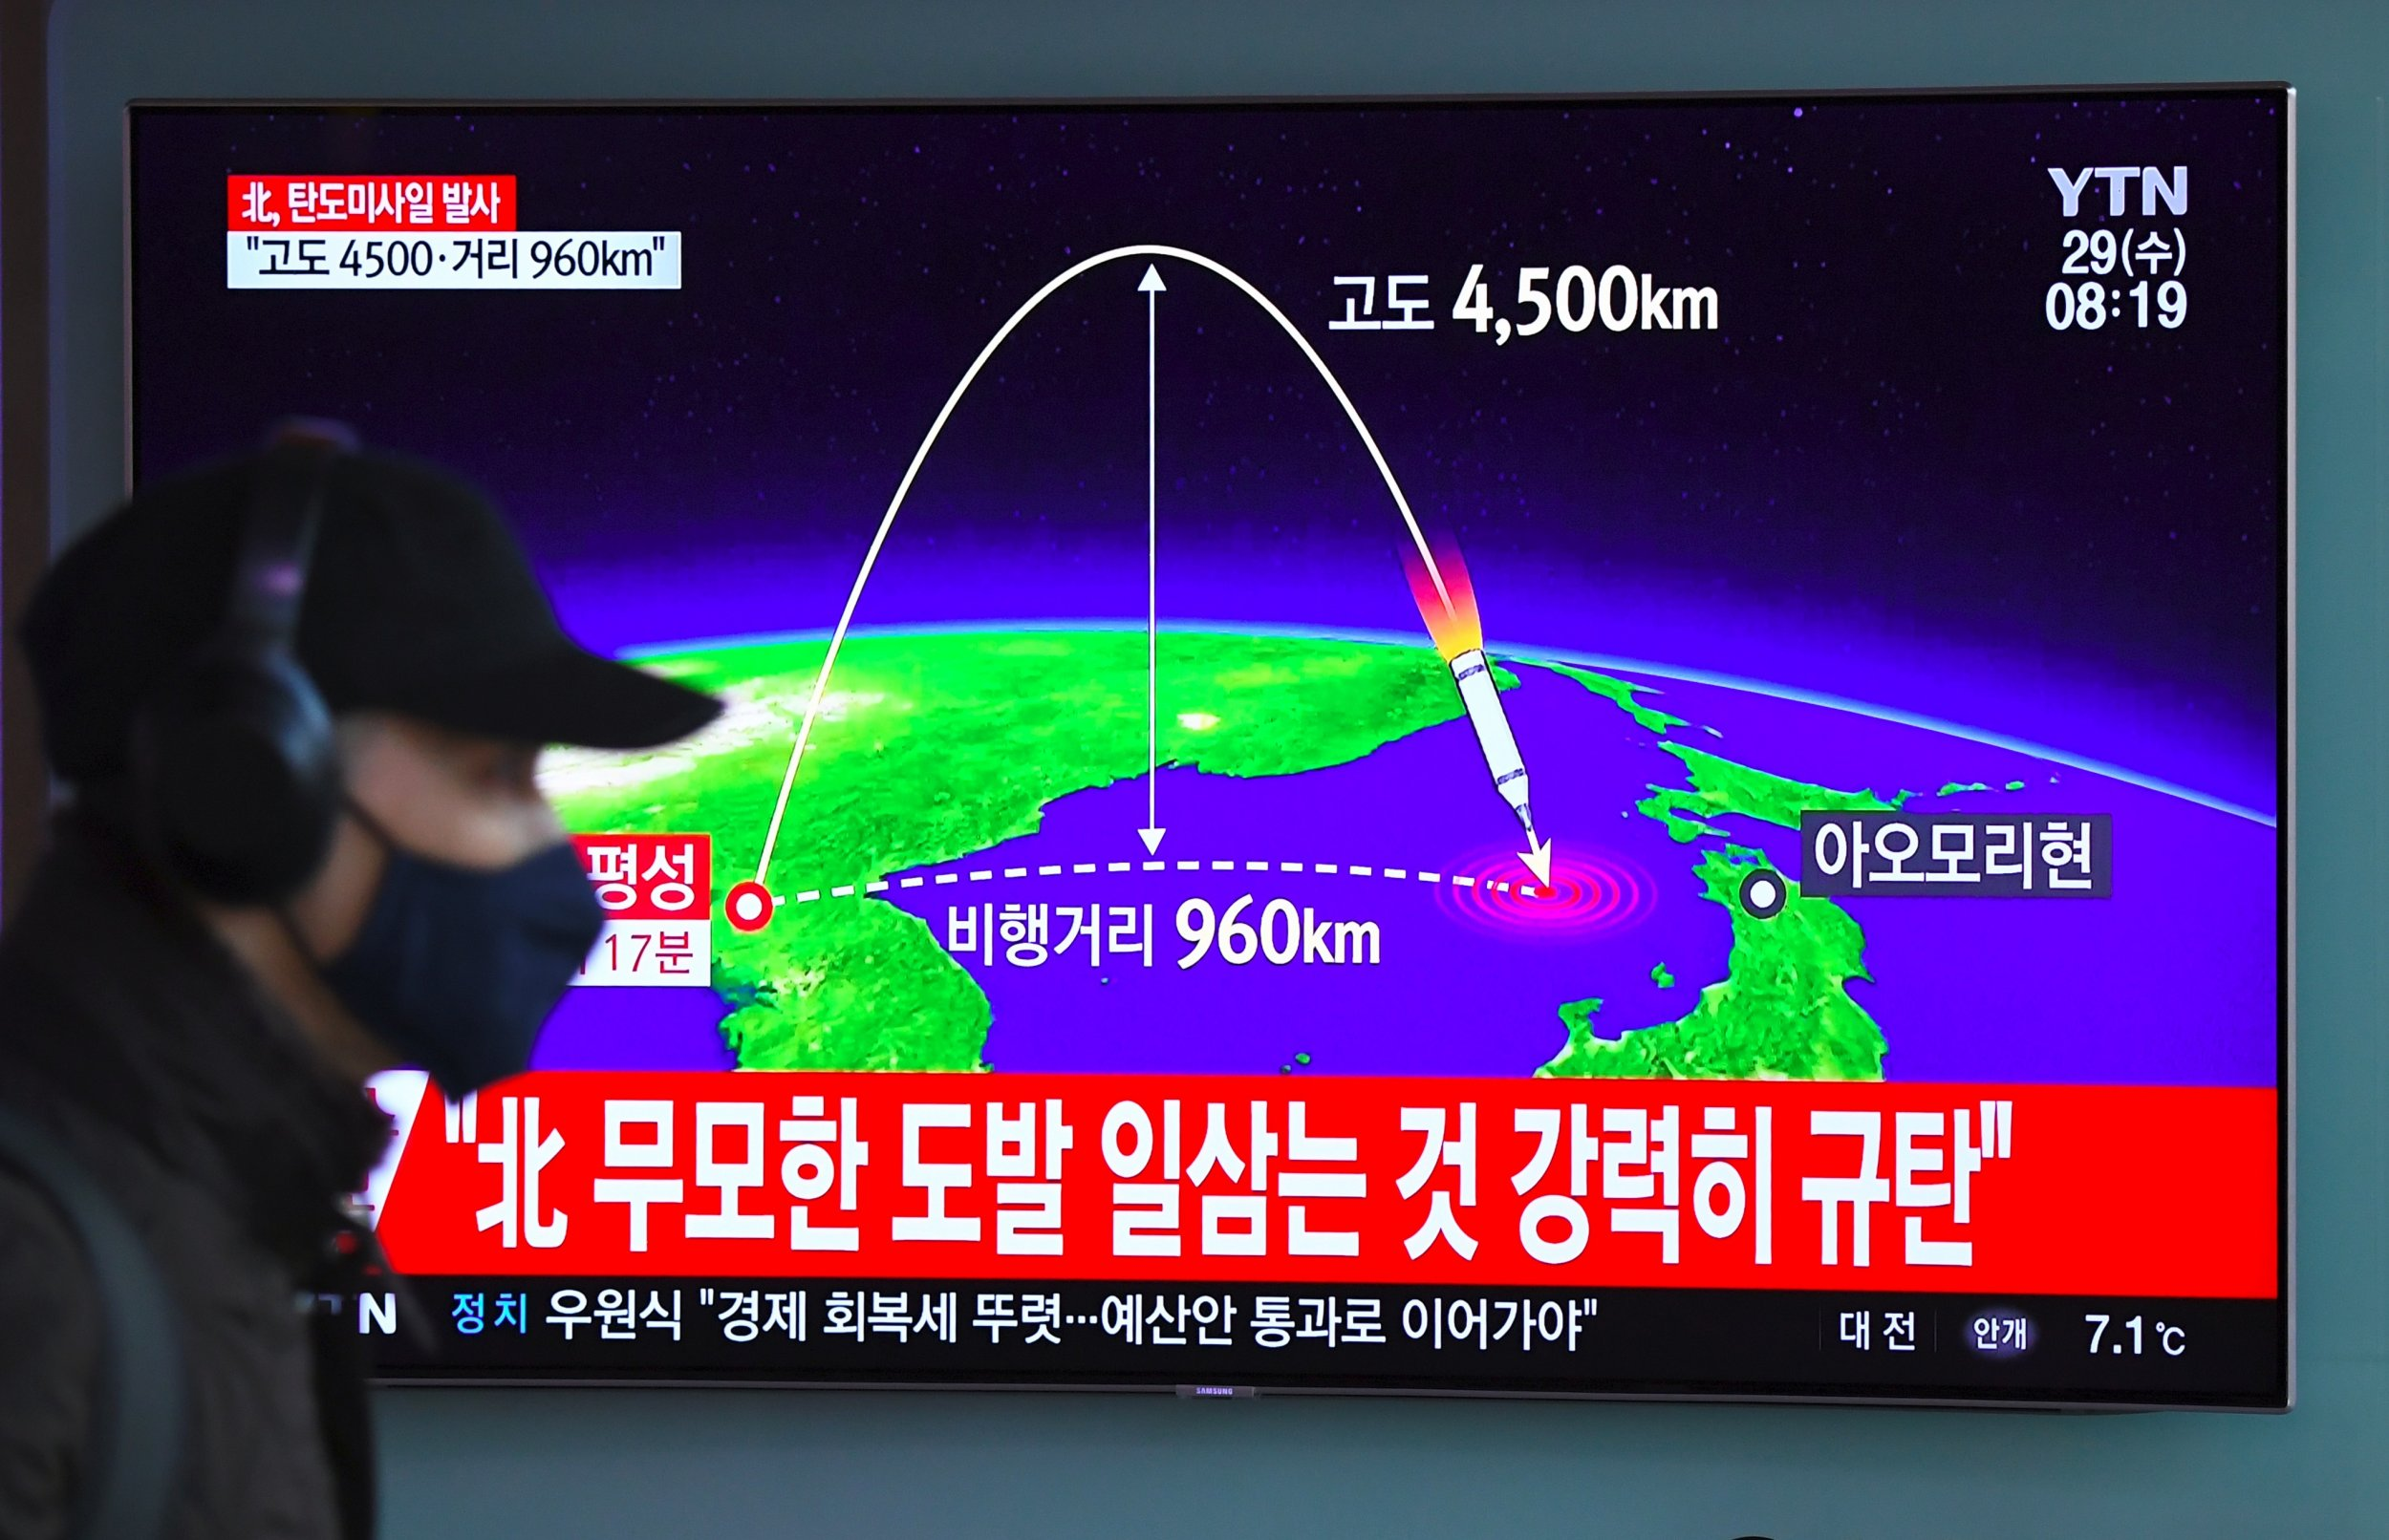 North Korea missiles Donald Trump UN resolution